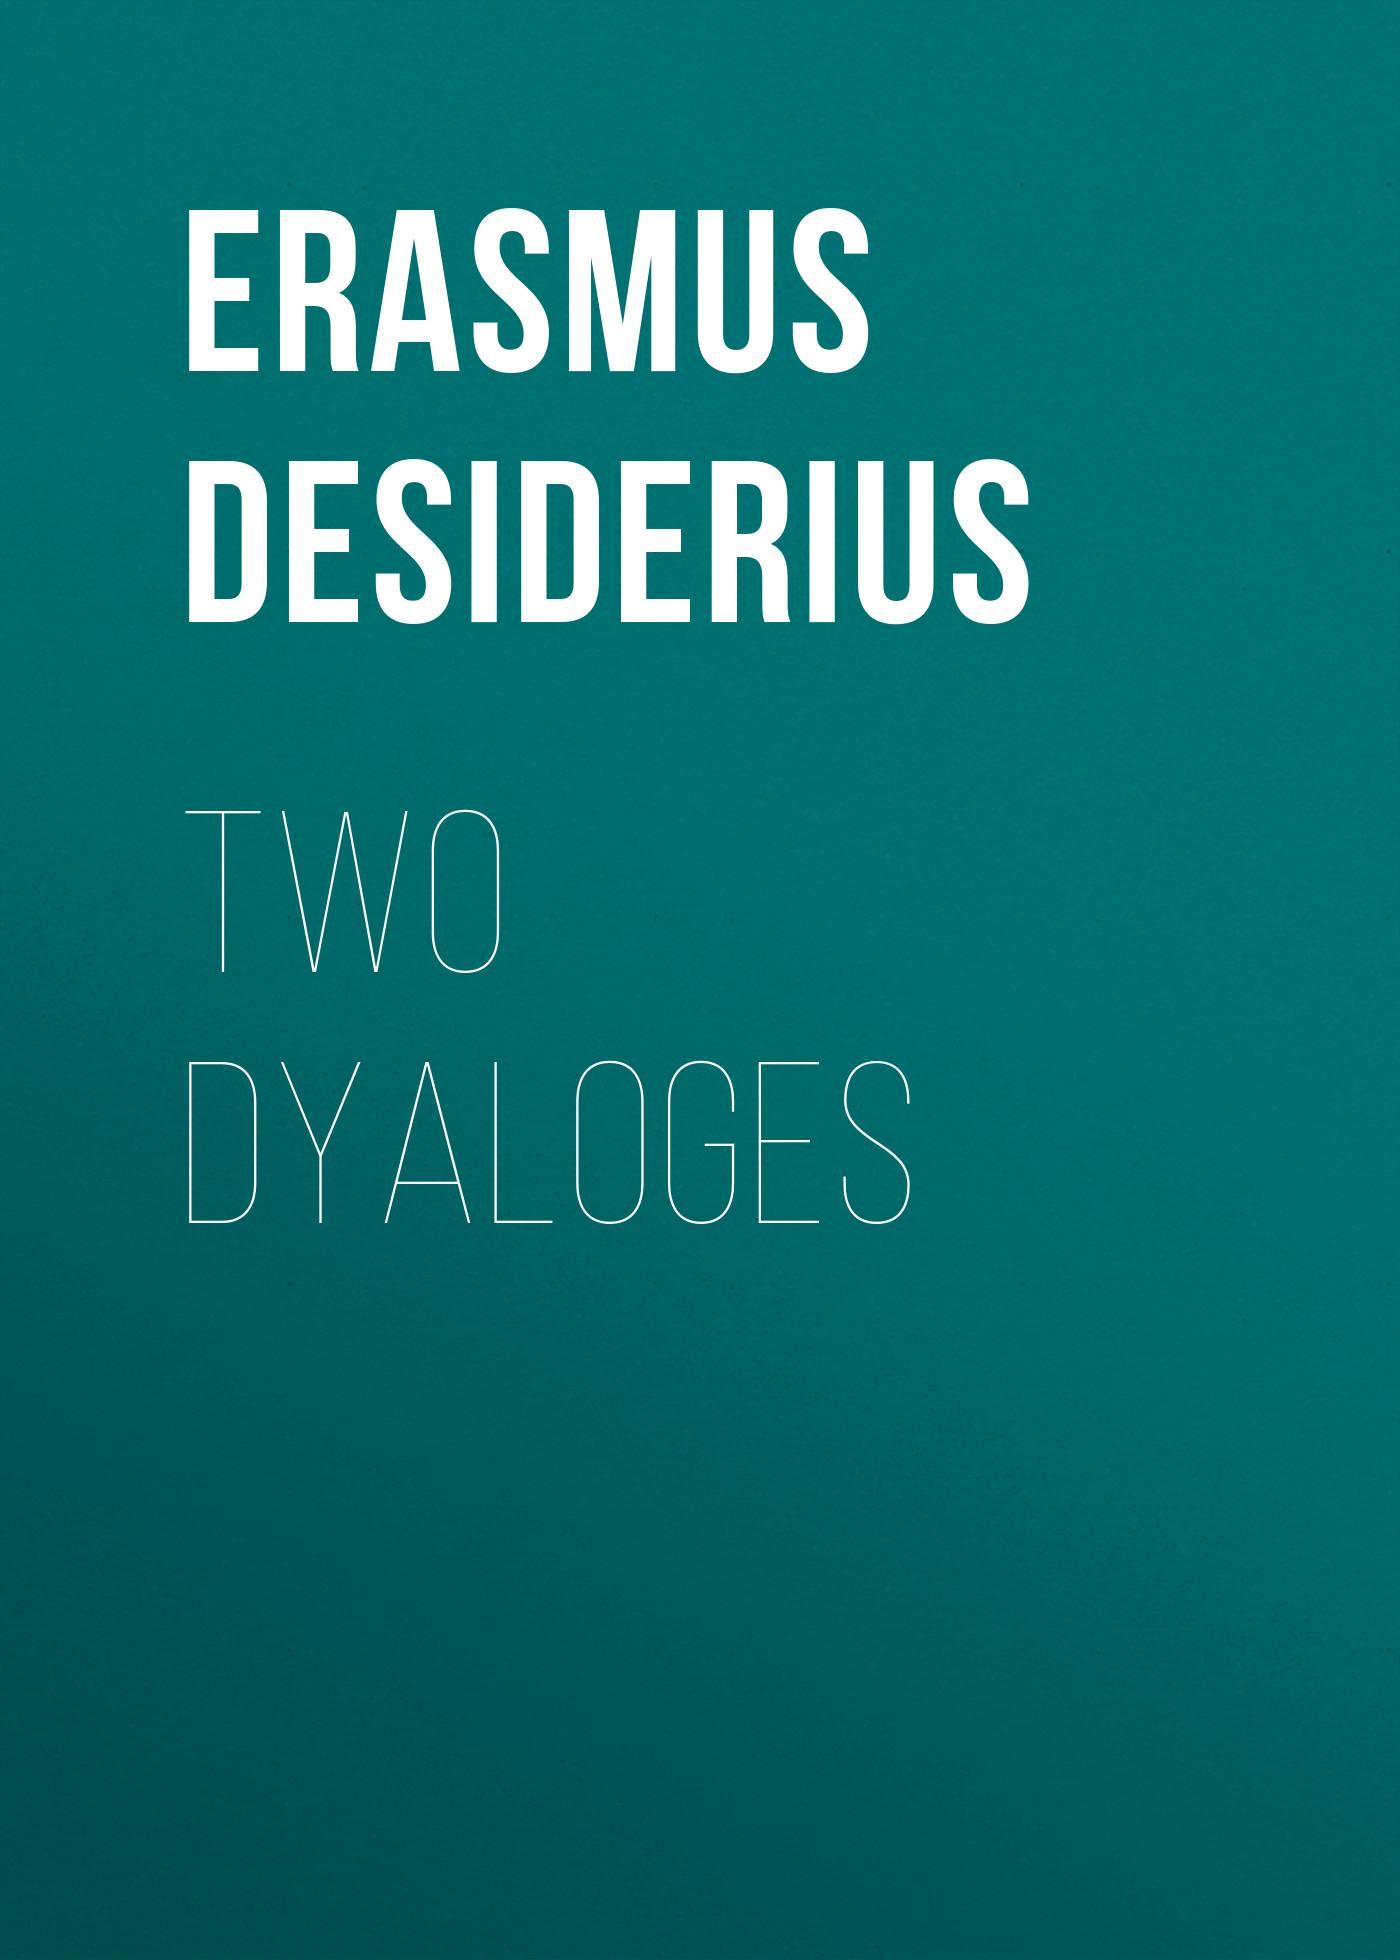 Erasmus Desiderius Two Dyaloges